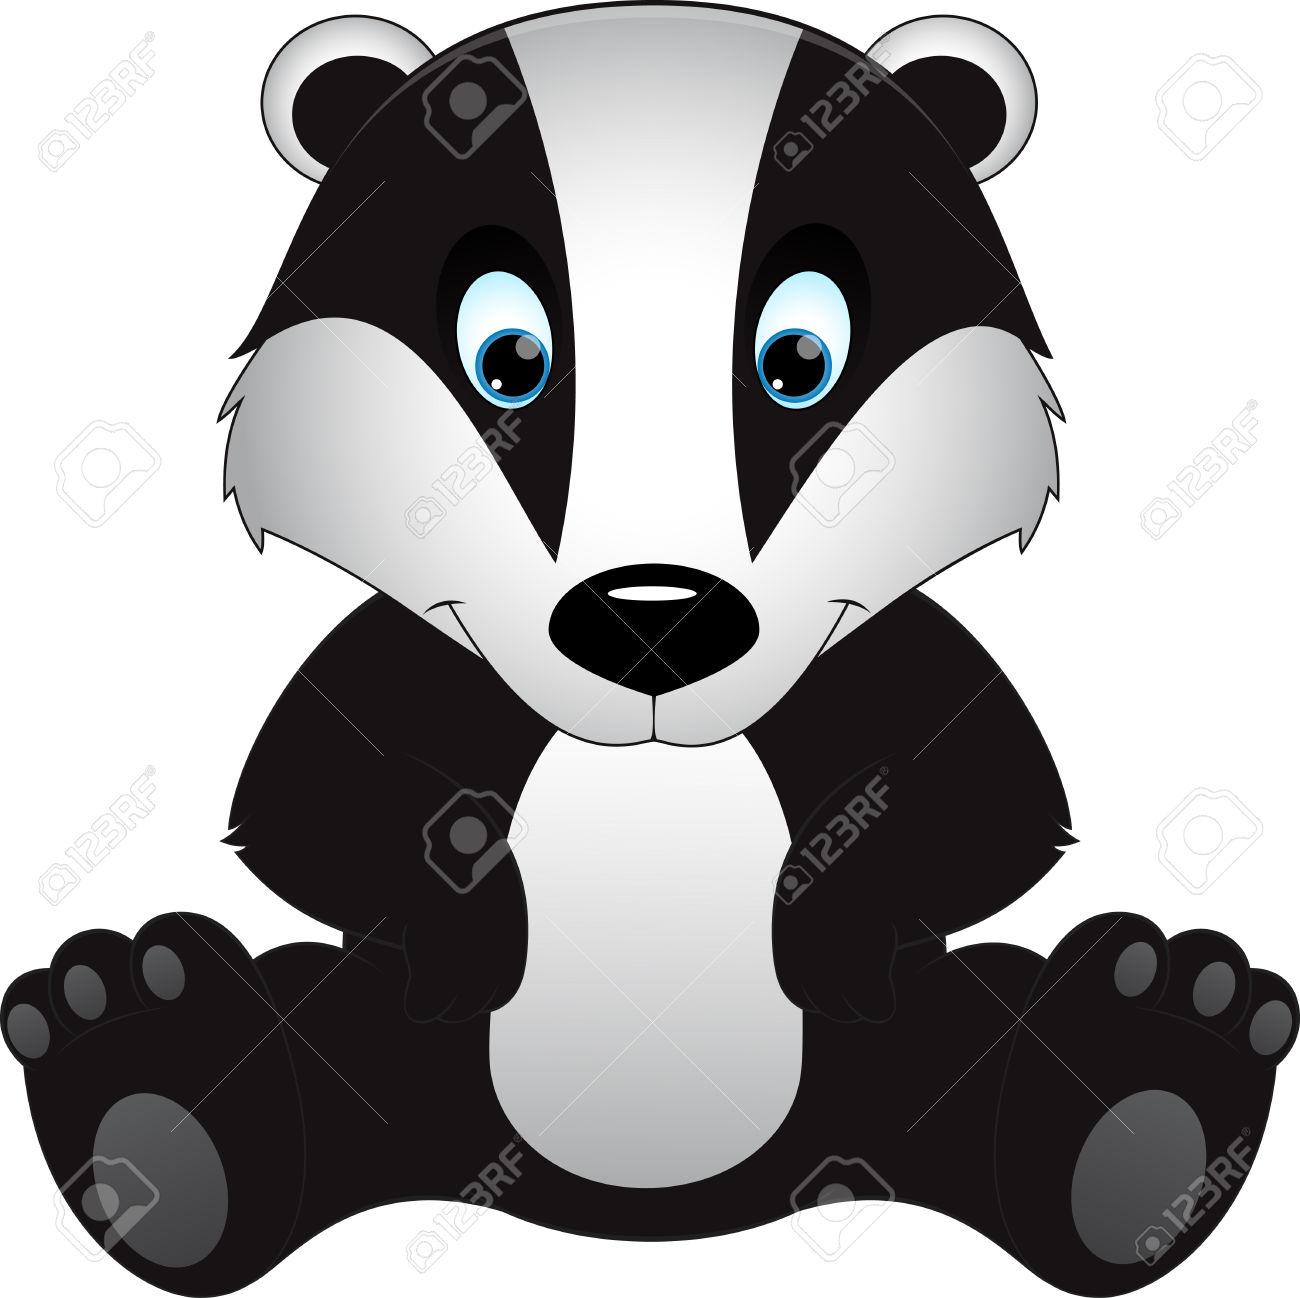 Badger Clipart -badger clipart -0